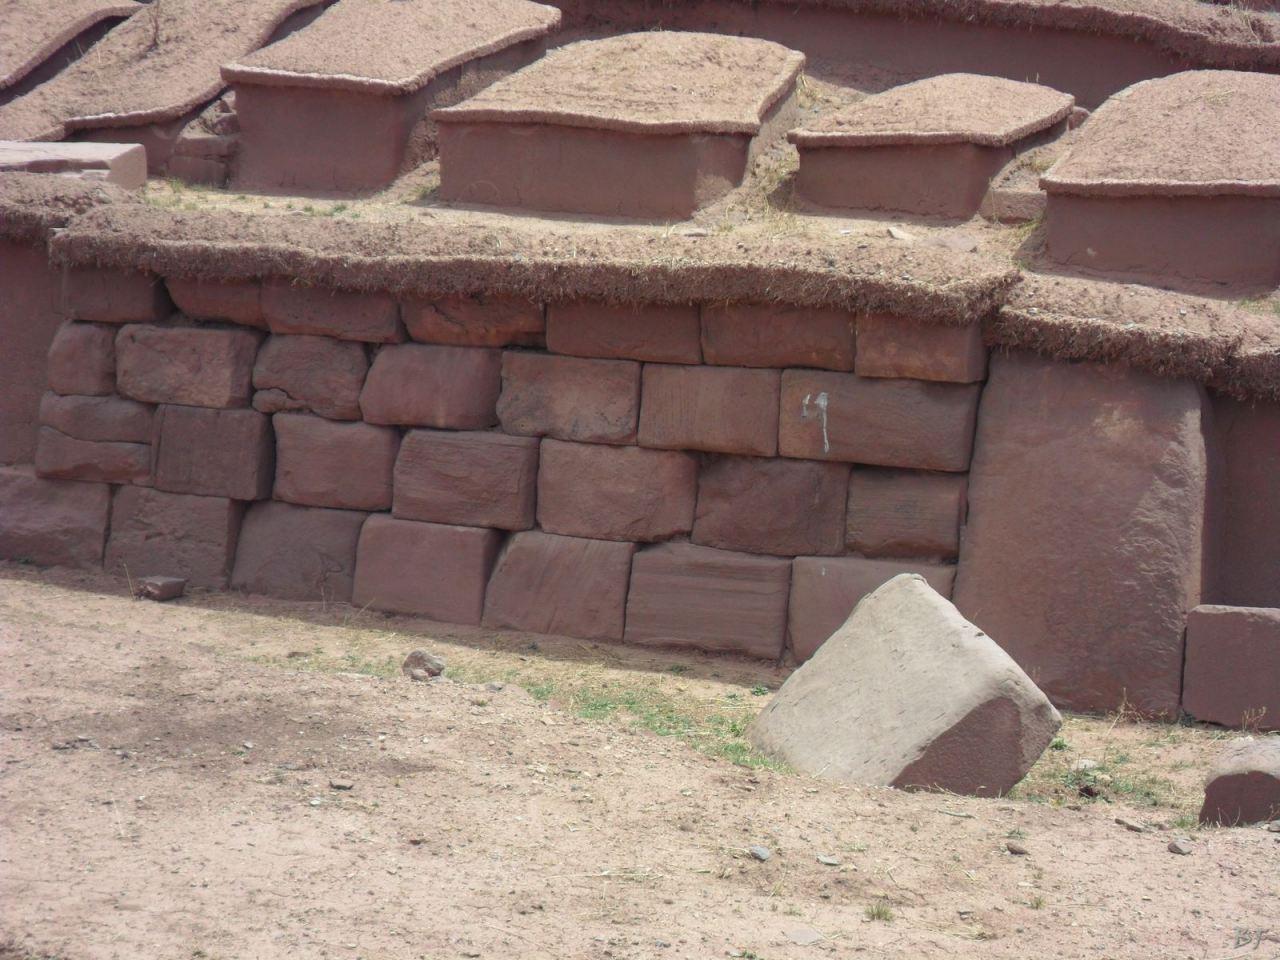 Sito-Megalitico-Piramide-Akapana-Kalasasaya-Menhir-Tiahuanaco-Bolivia-105